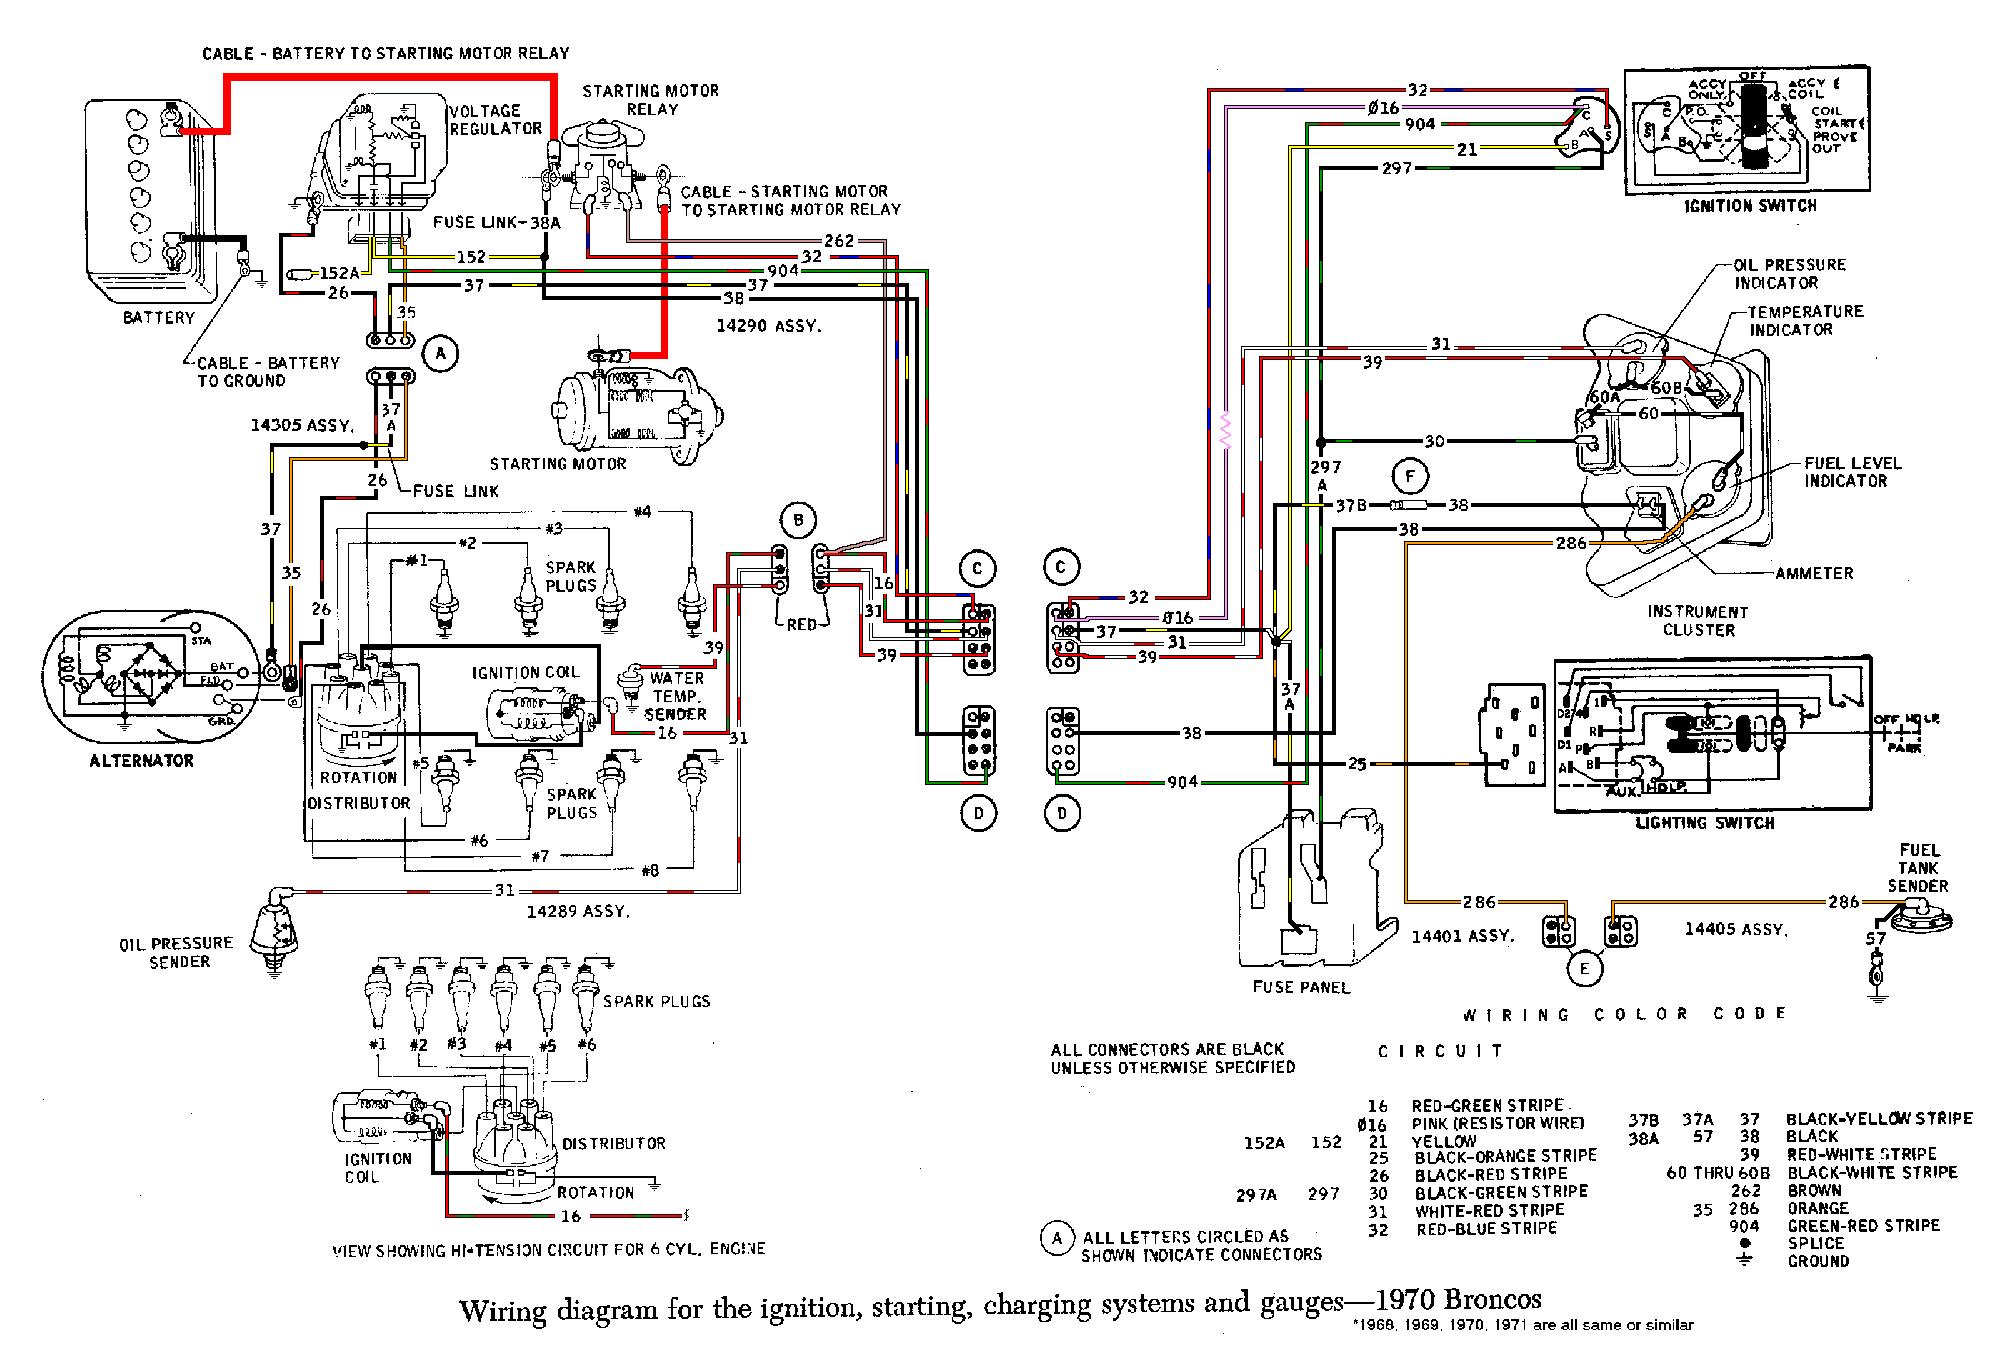 1970 Bronco Wiring Diagram